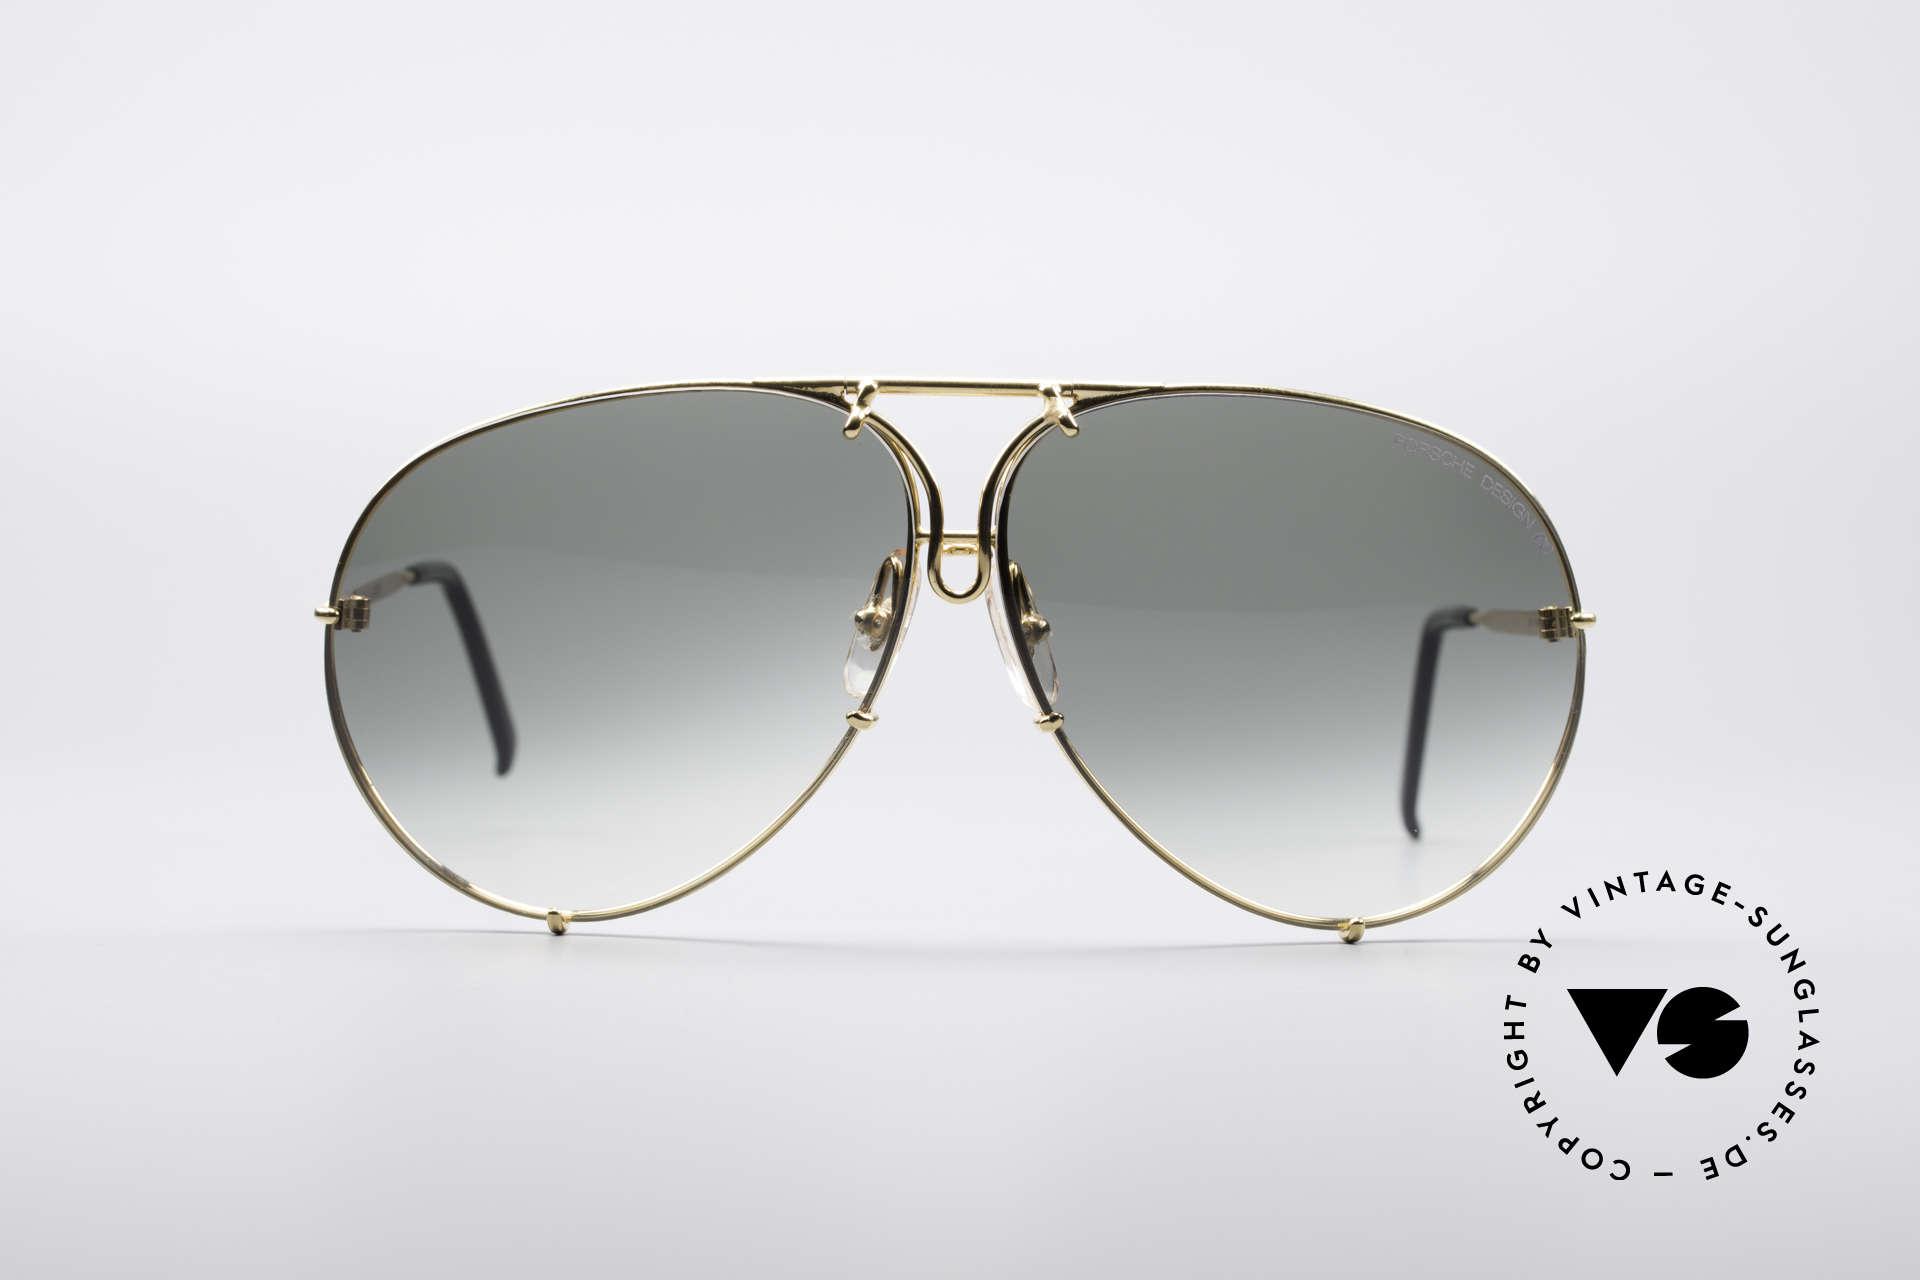 84366aa449 Sunglasses Porsche 5621 Large 80 s Aviator Shades